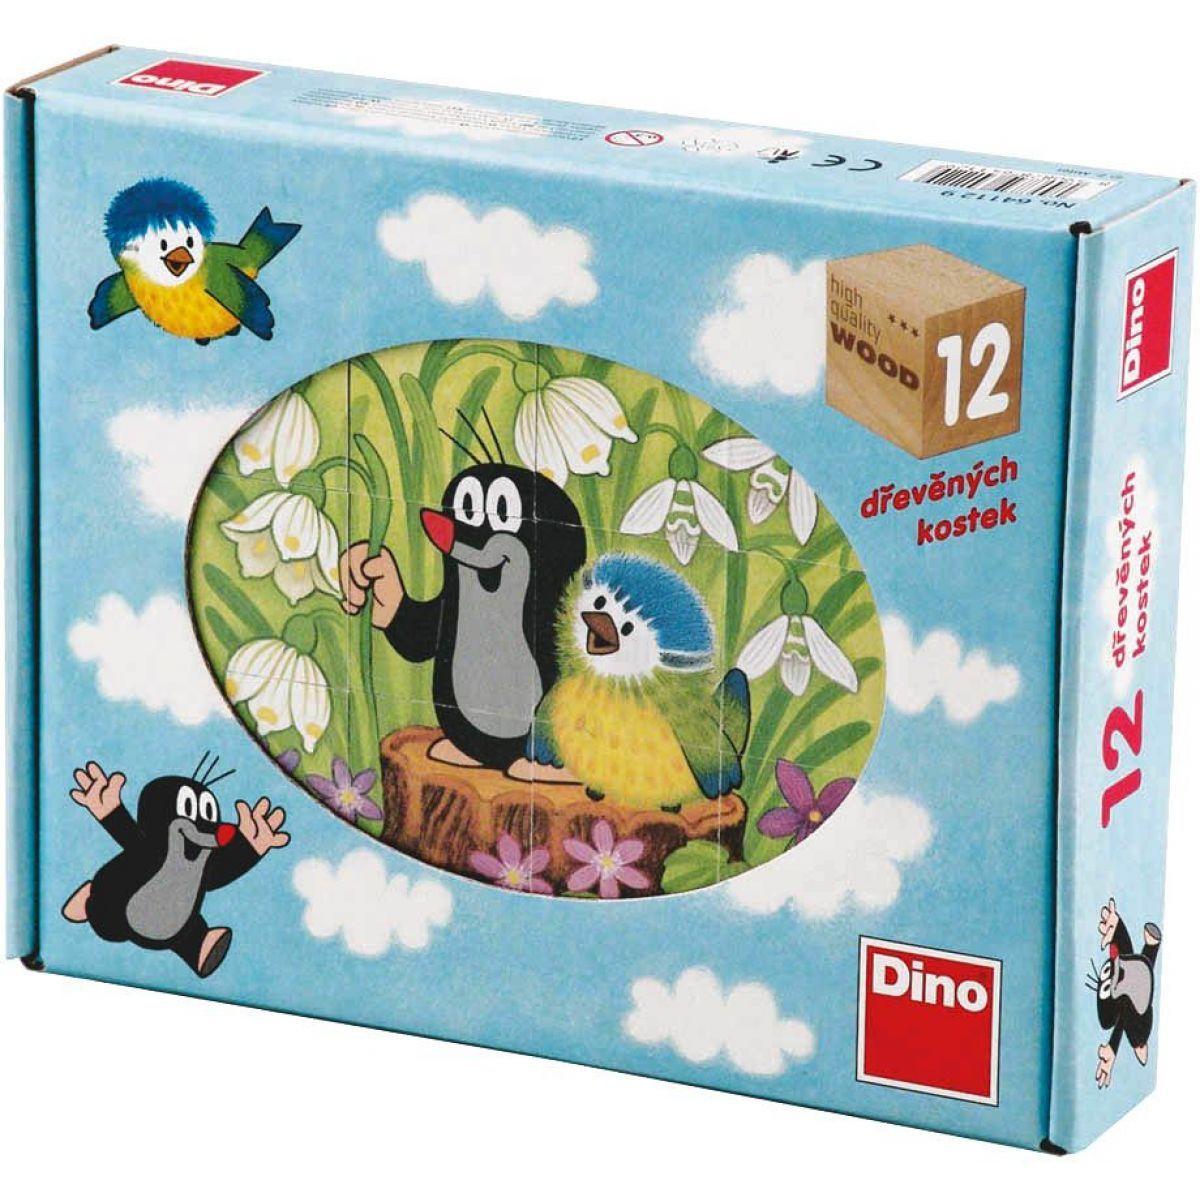 Dino dřevěné kostky krtek a ptáček 12 kostek